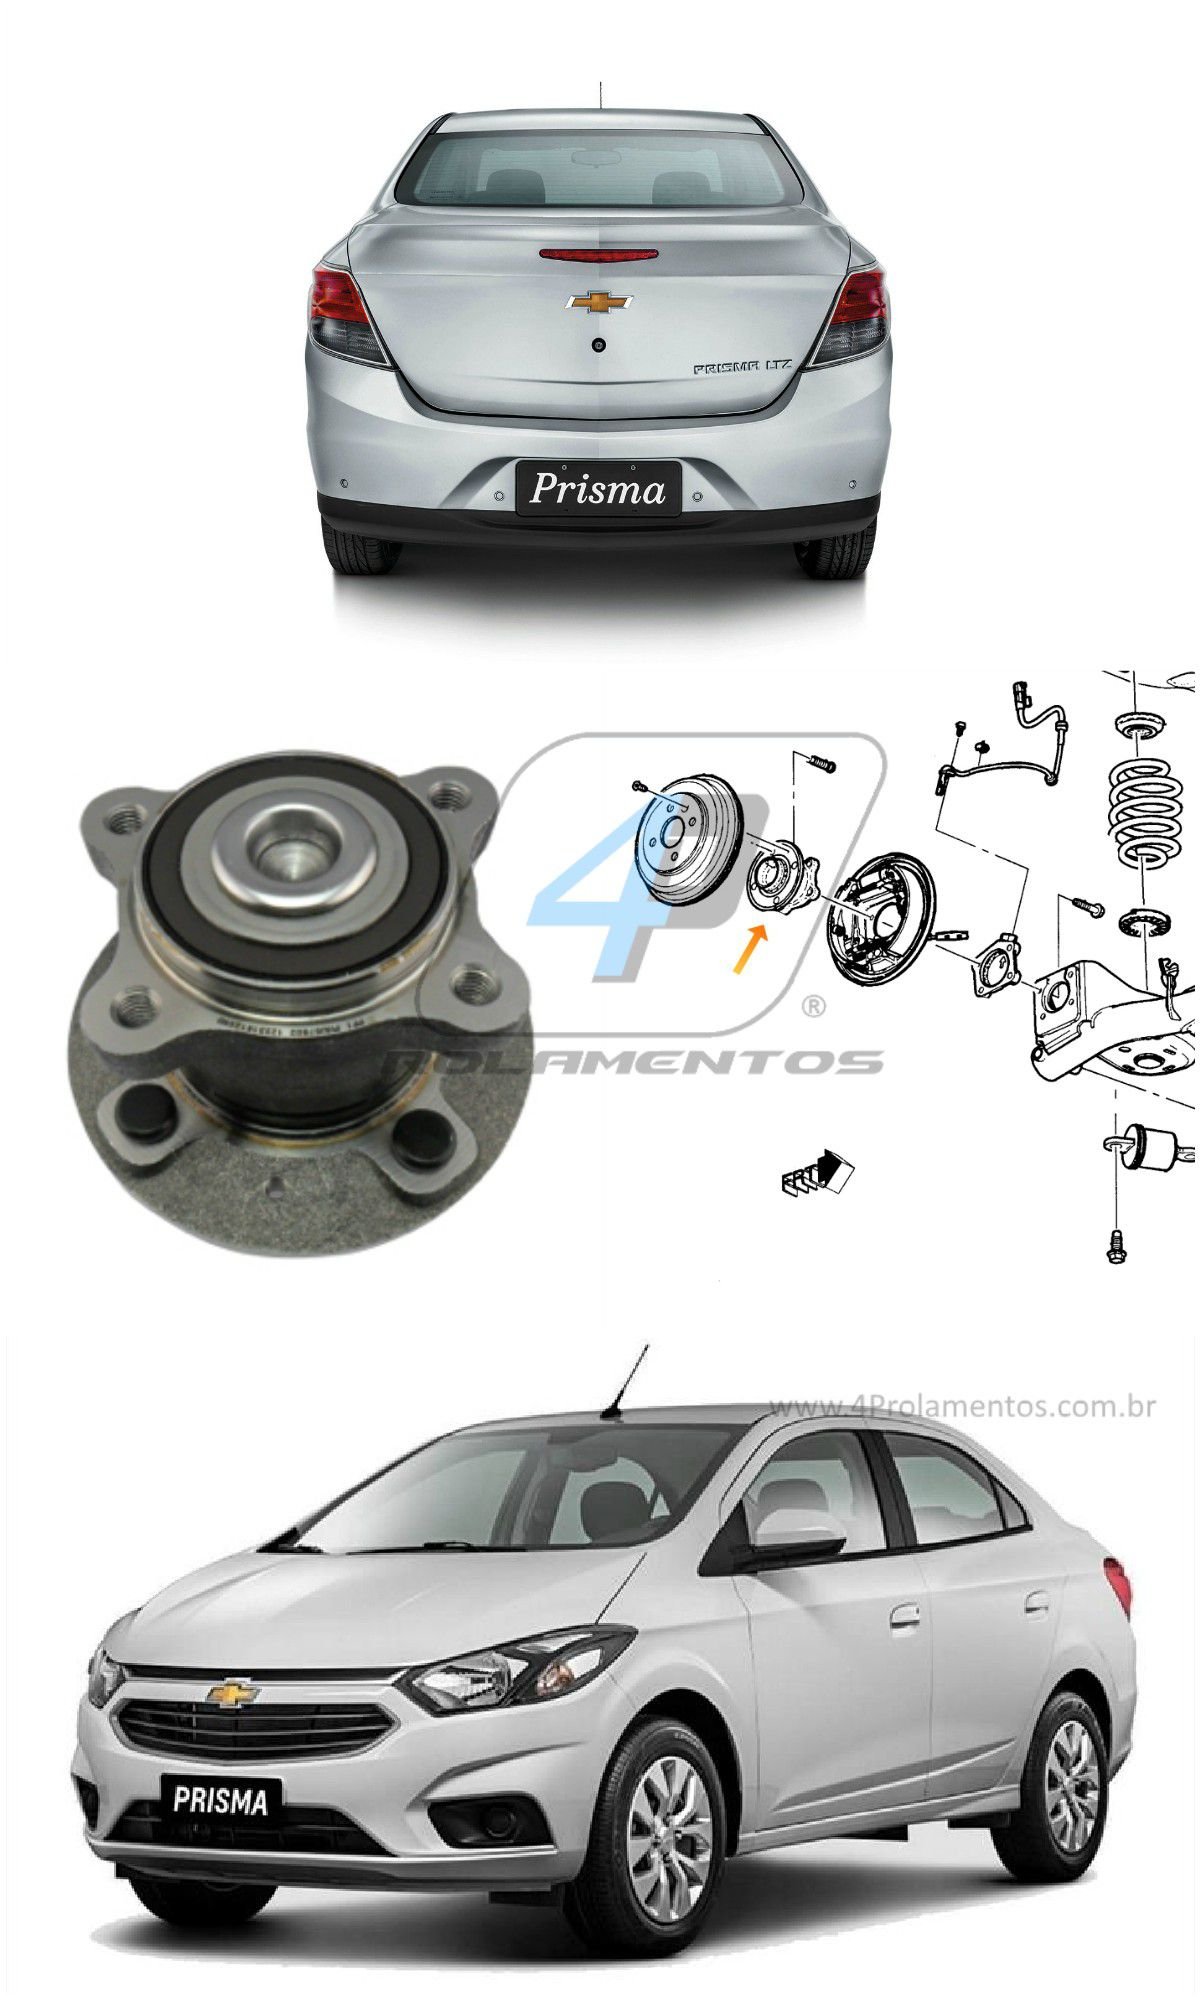 Cubo Roda Traseira CHEVROLET Prisma 2013 até 2017, com ABS